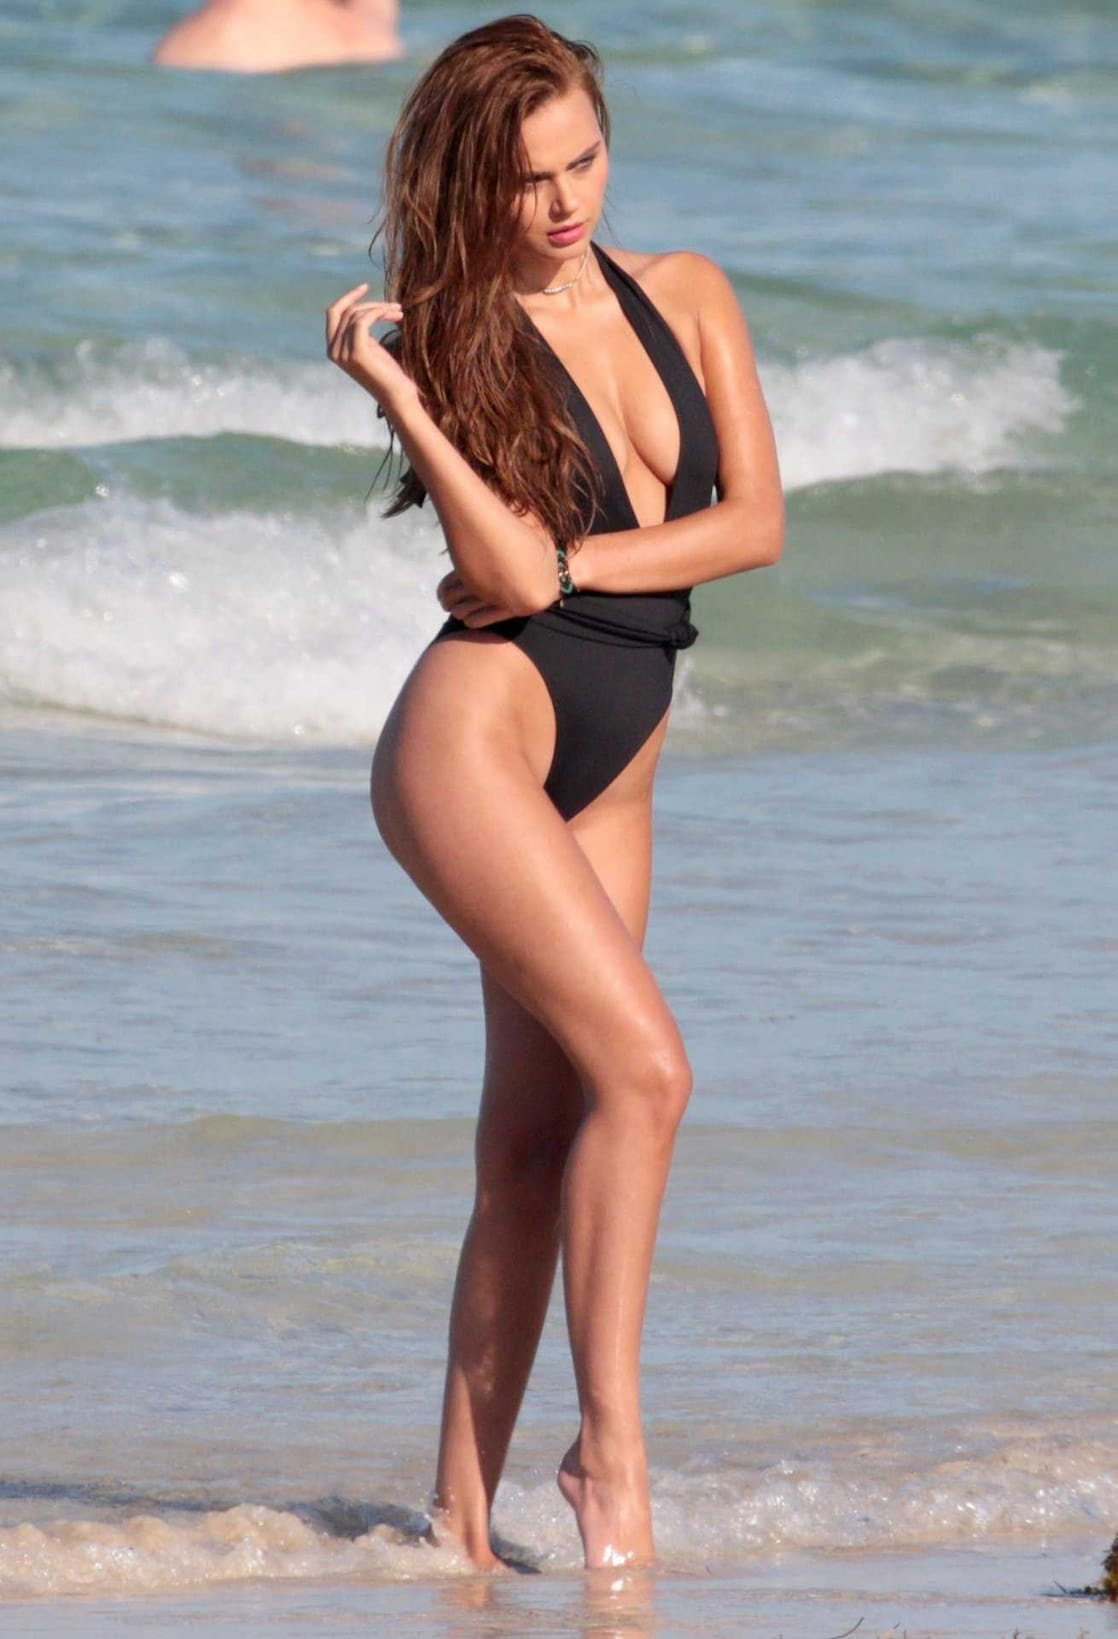 Bikini Xenia Deli nude (67 photos), Sexy, Cleavage, Instagram, cleavage 2018